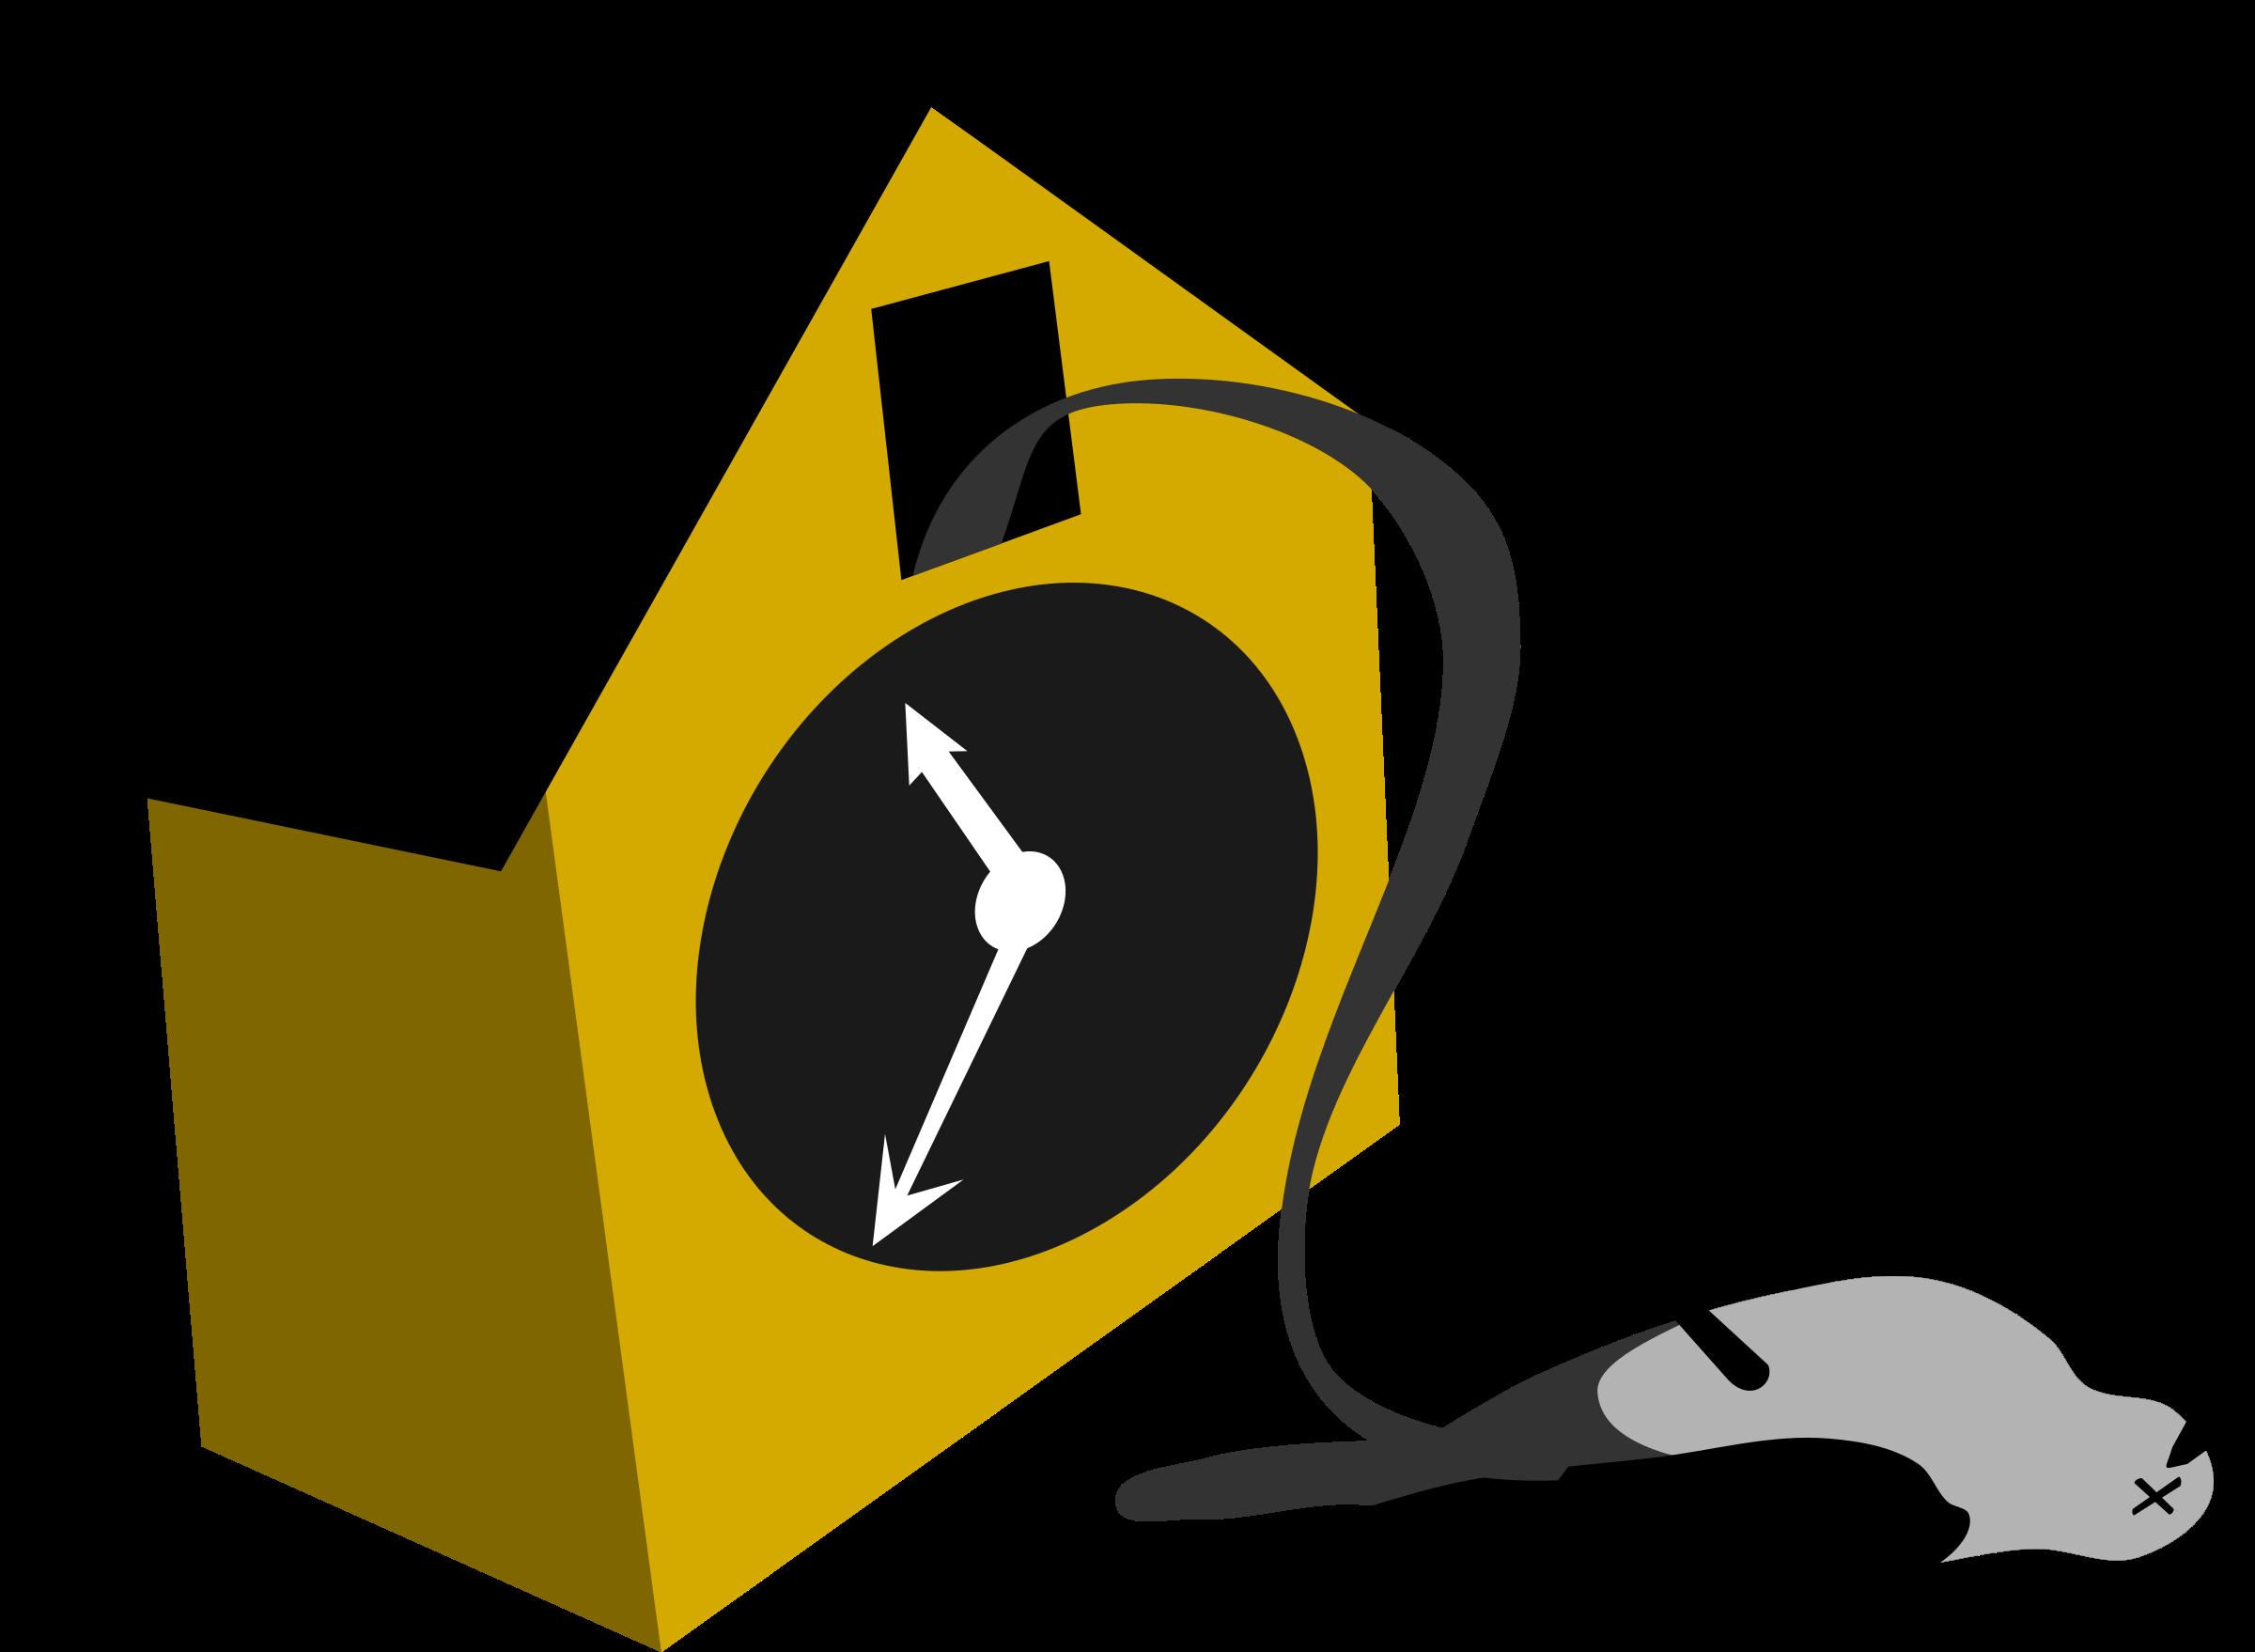 2400x1758 Cuckoo Clock Icons Png